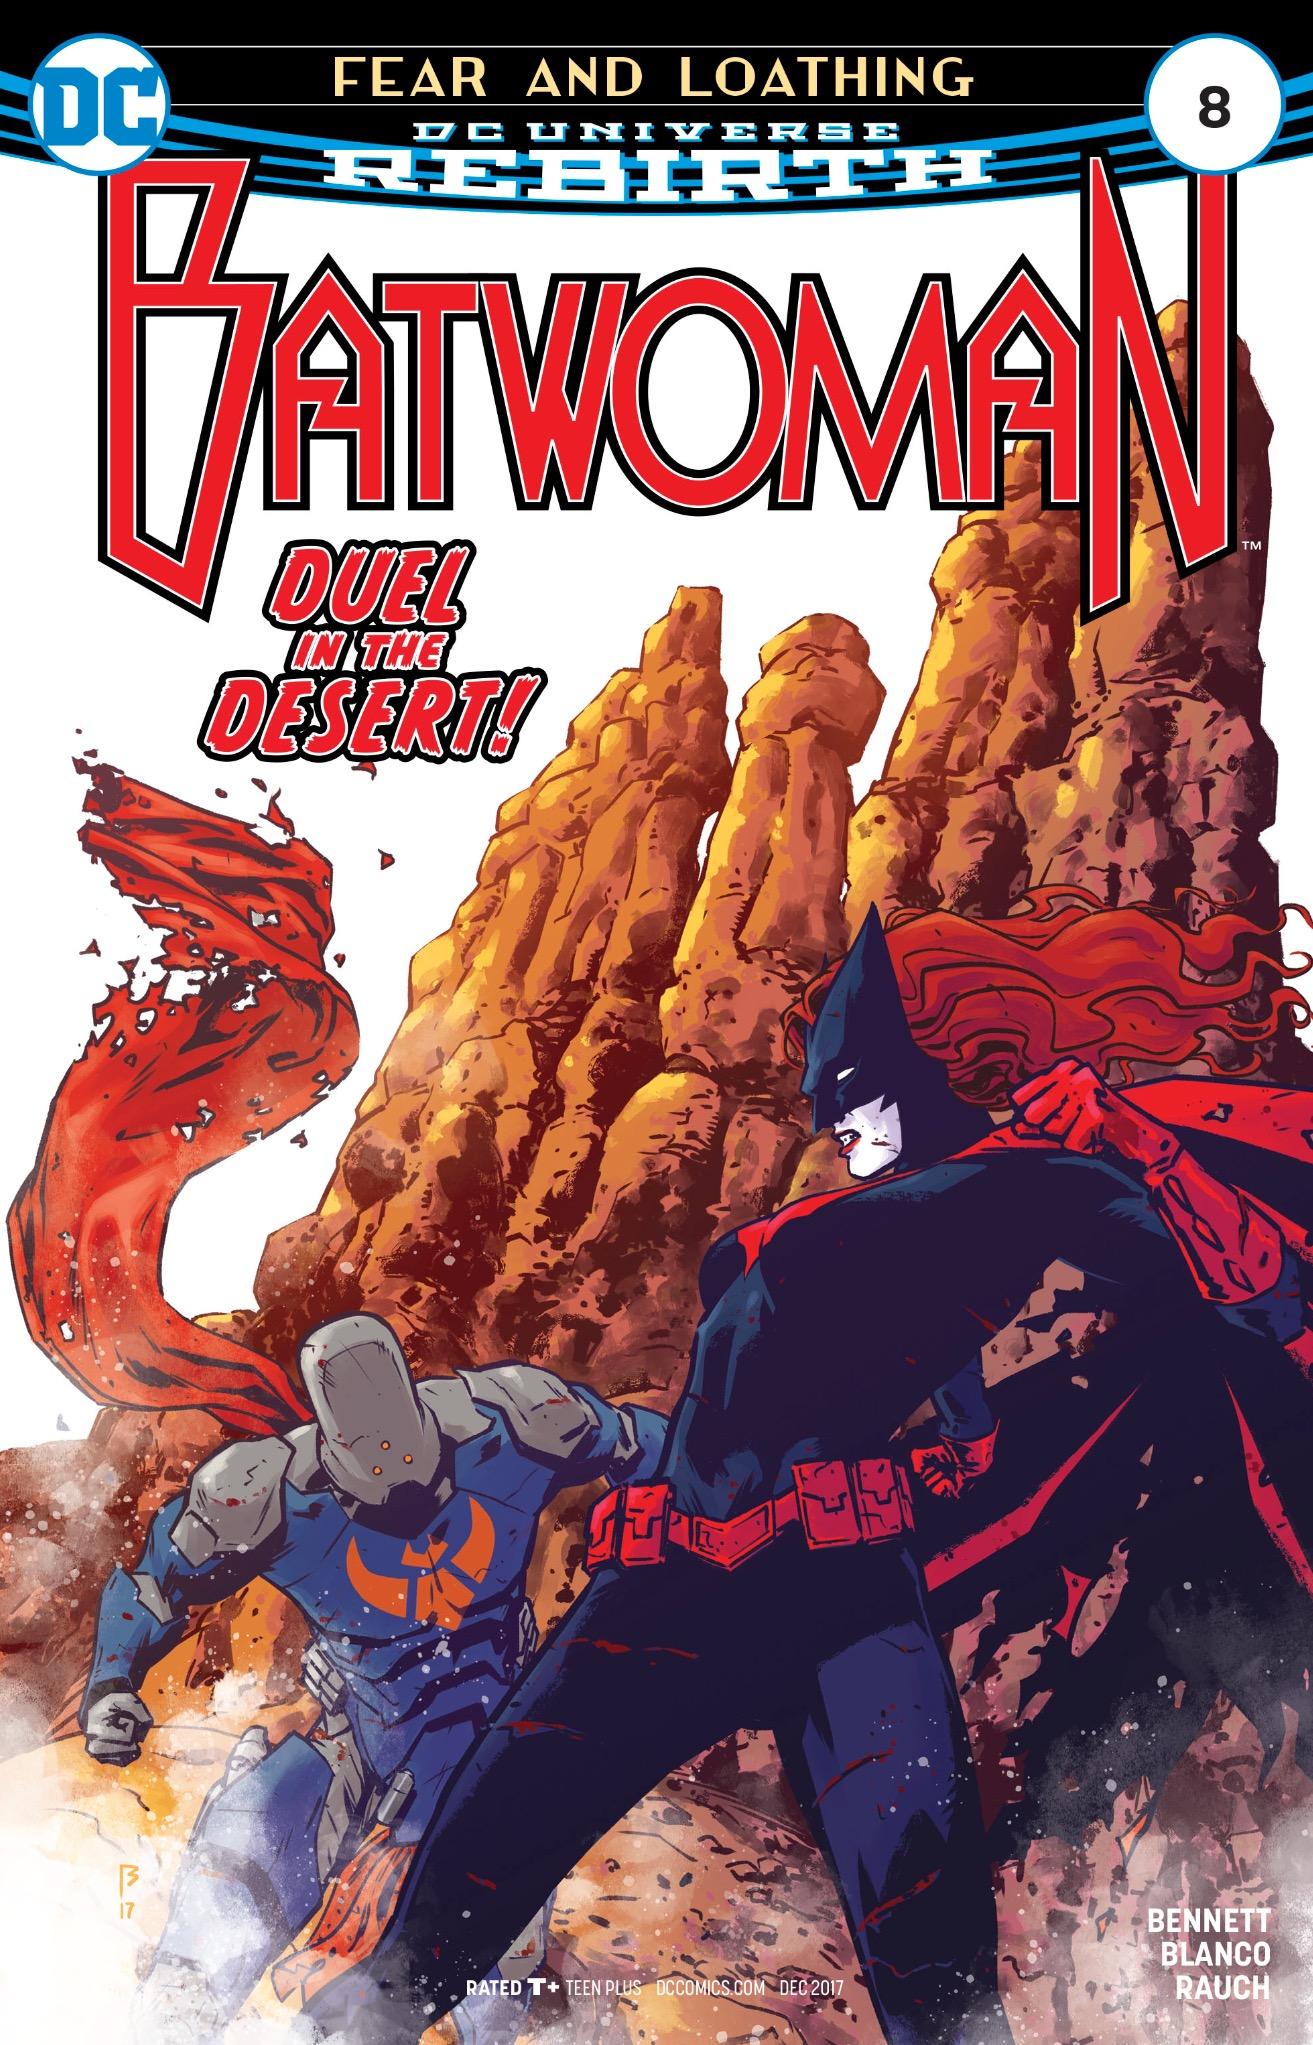 Batwoman #8 Cover